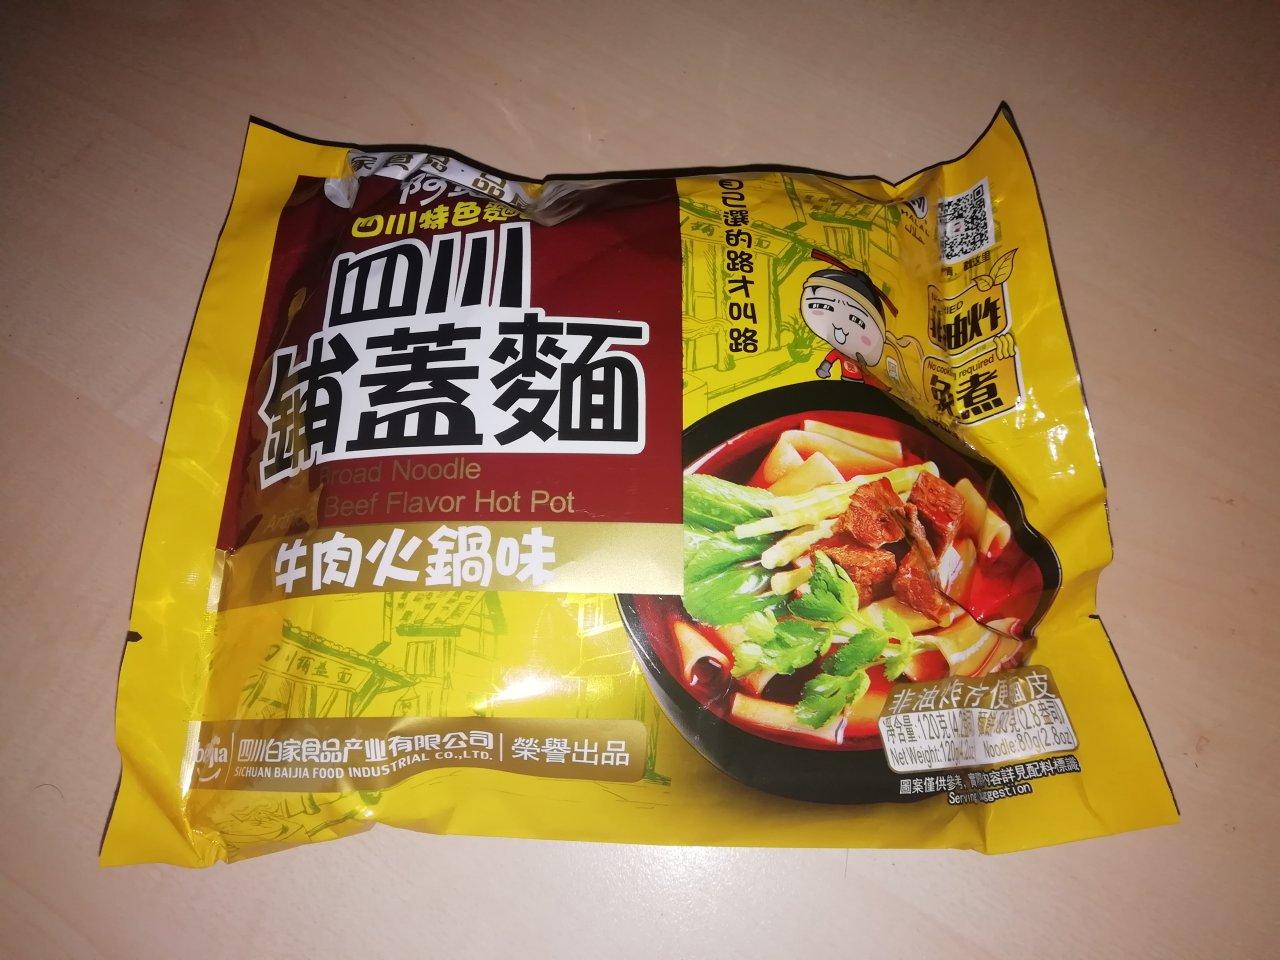 "#1540: Sichuan Baijia ""Broad Noodle Artificial Beef Flavor Hot Pot"" (2019)"